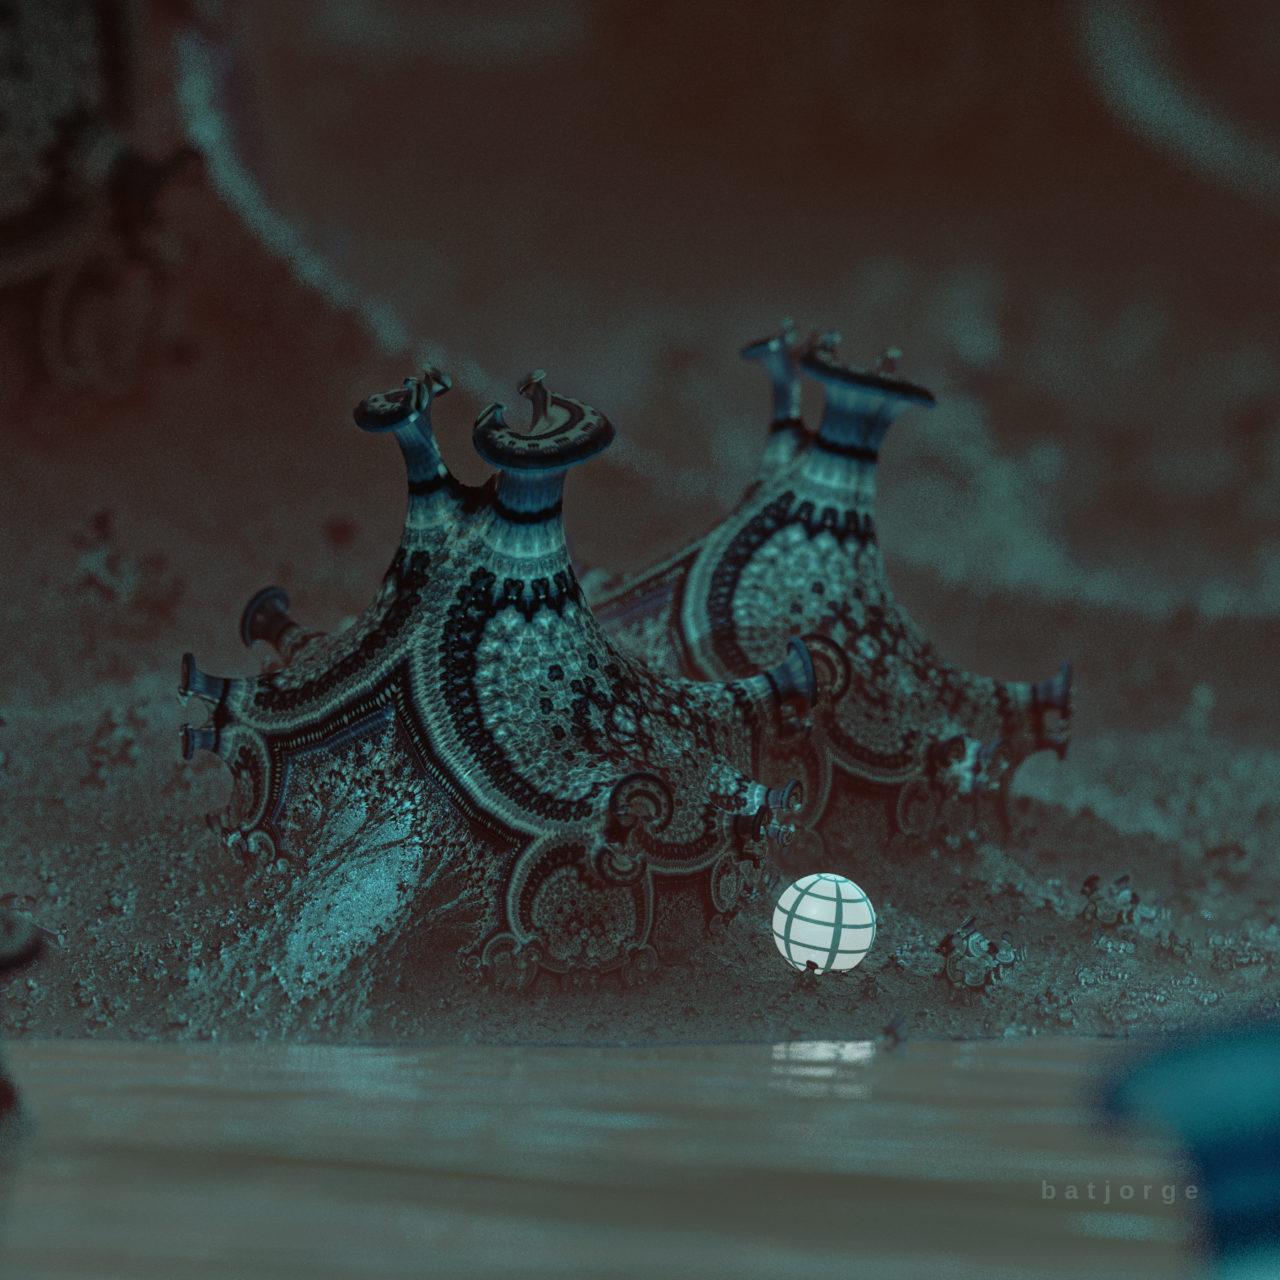 3D fractal mandelbulber amazingsurf water and luminous sphere